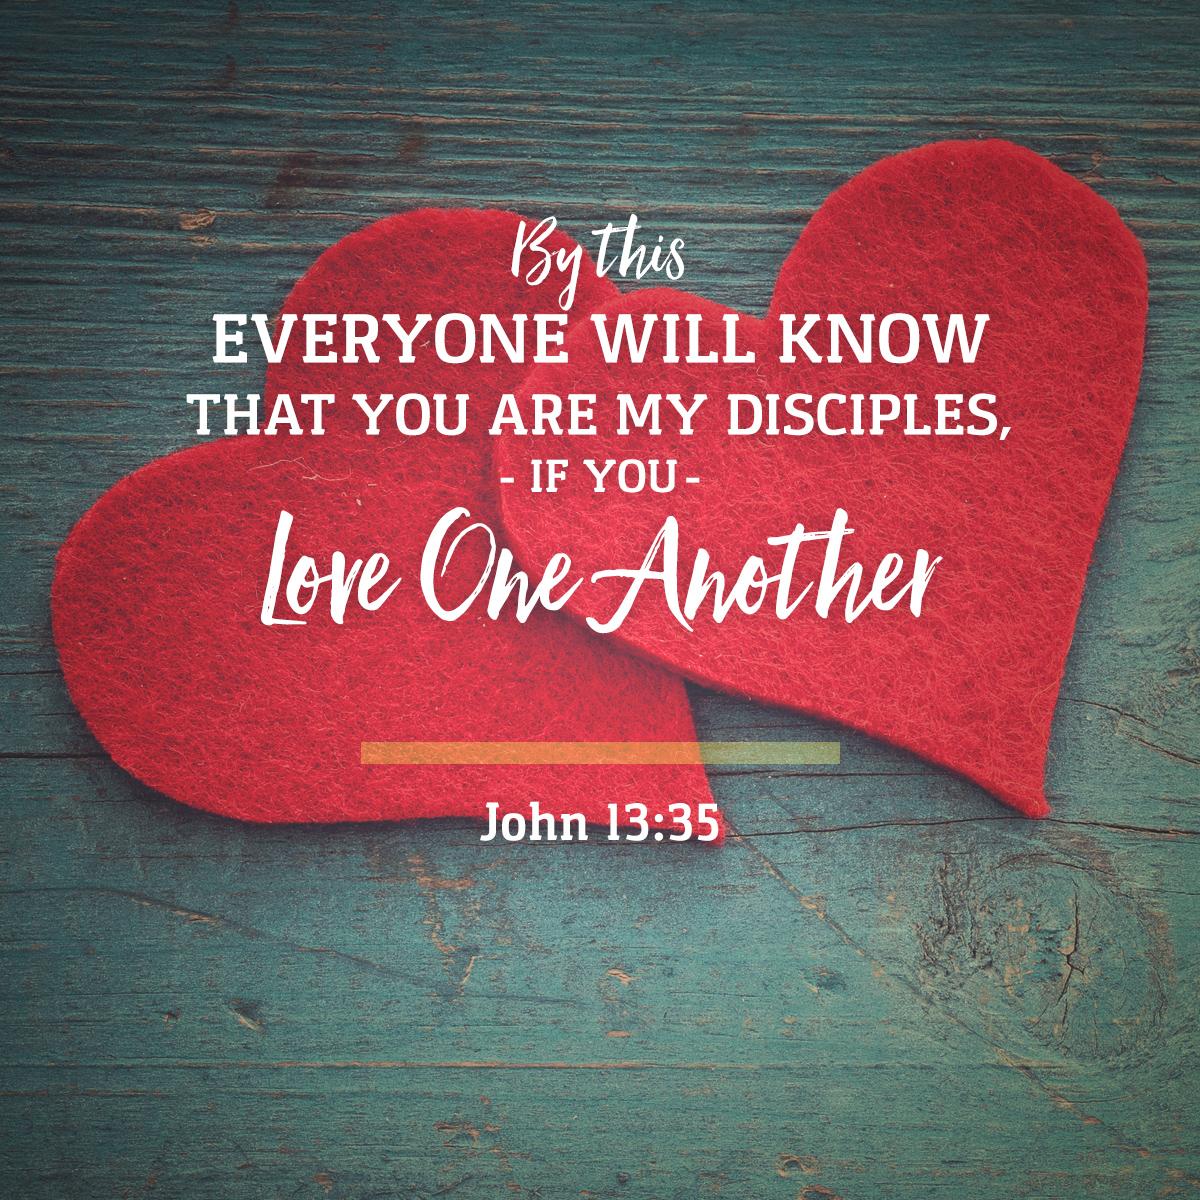 John 13:35 Daily Verse